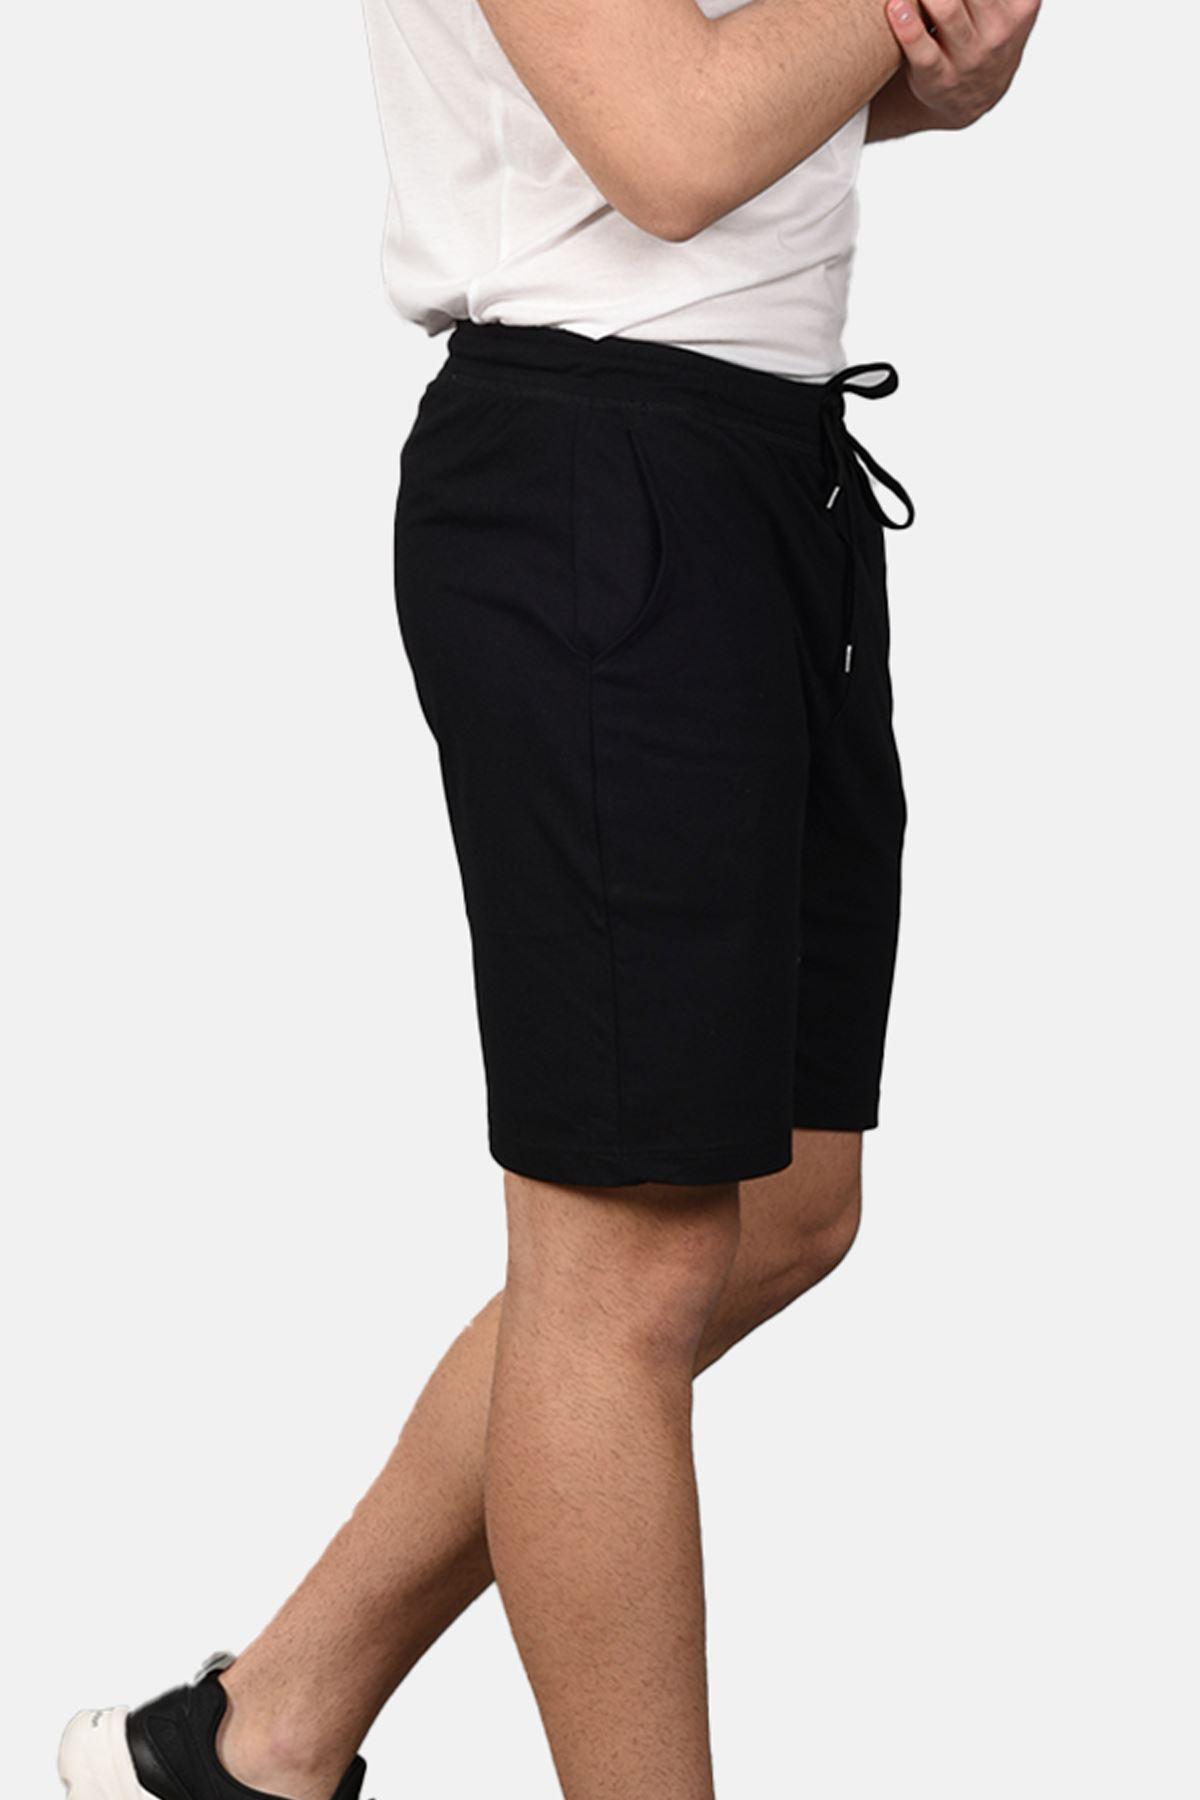 Malabadi Erkek Siyah Alt Siyah Üst Yuvarlak Yaka Şortlu Pijama Takımı M565